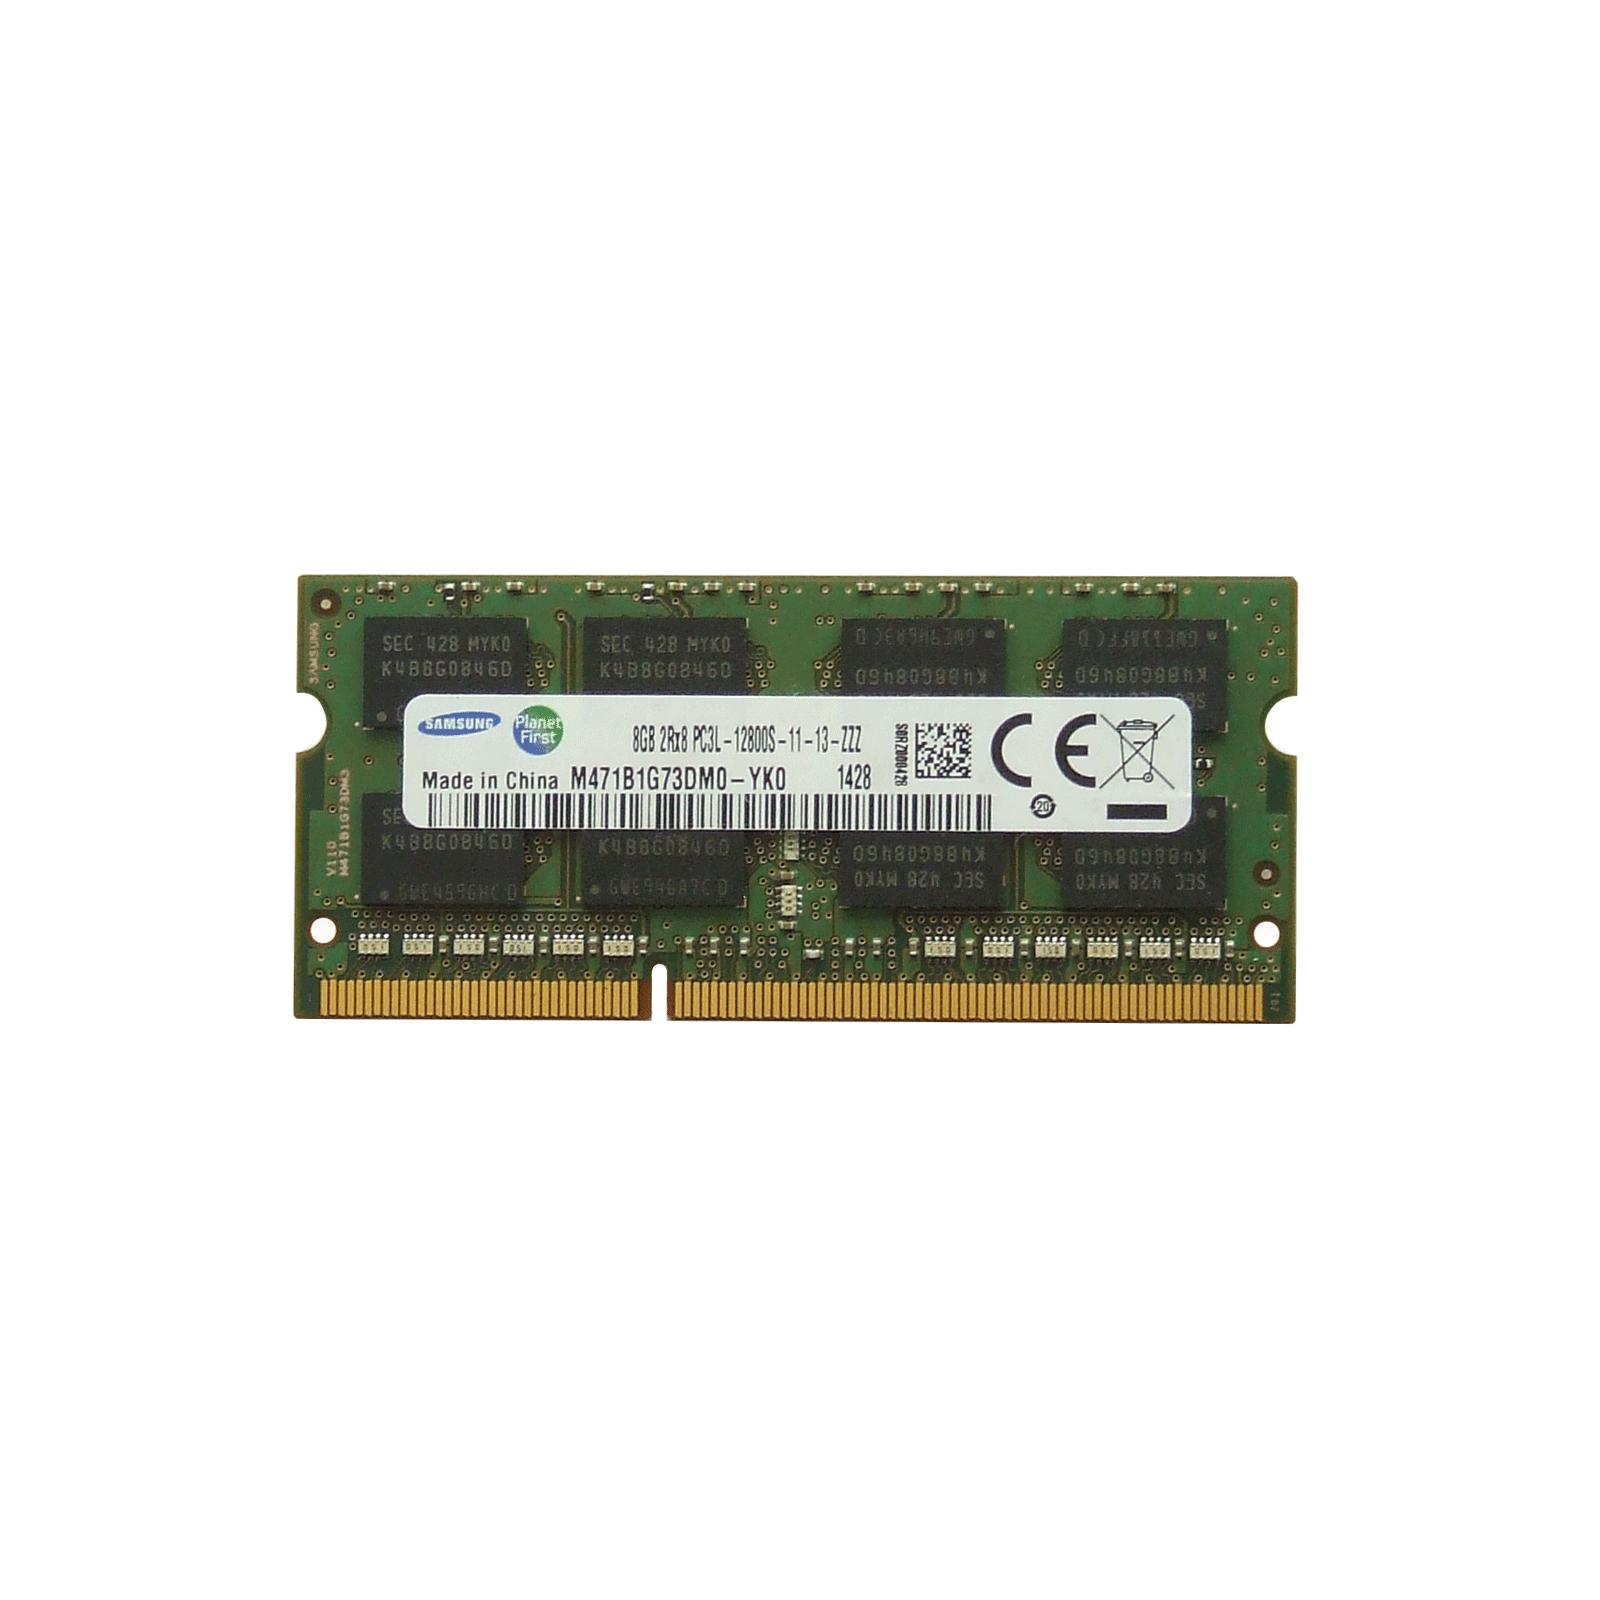 Модуль памяти для ноутбука SoDIMM DDR3 8GB 1600 MHz Samsung (M471B1G73DM0-YK0)